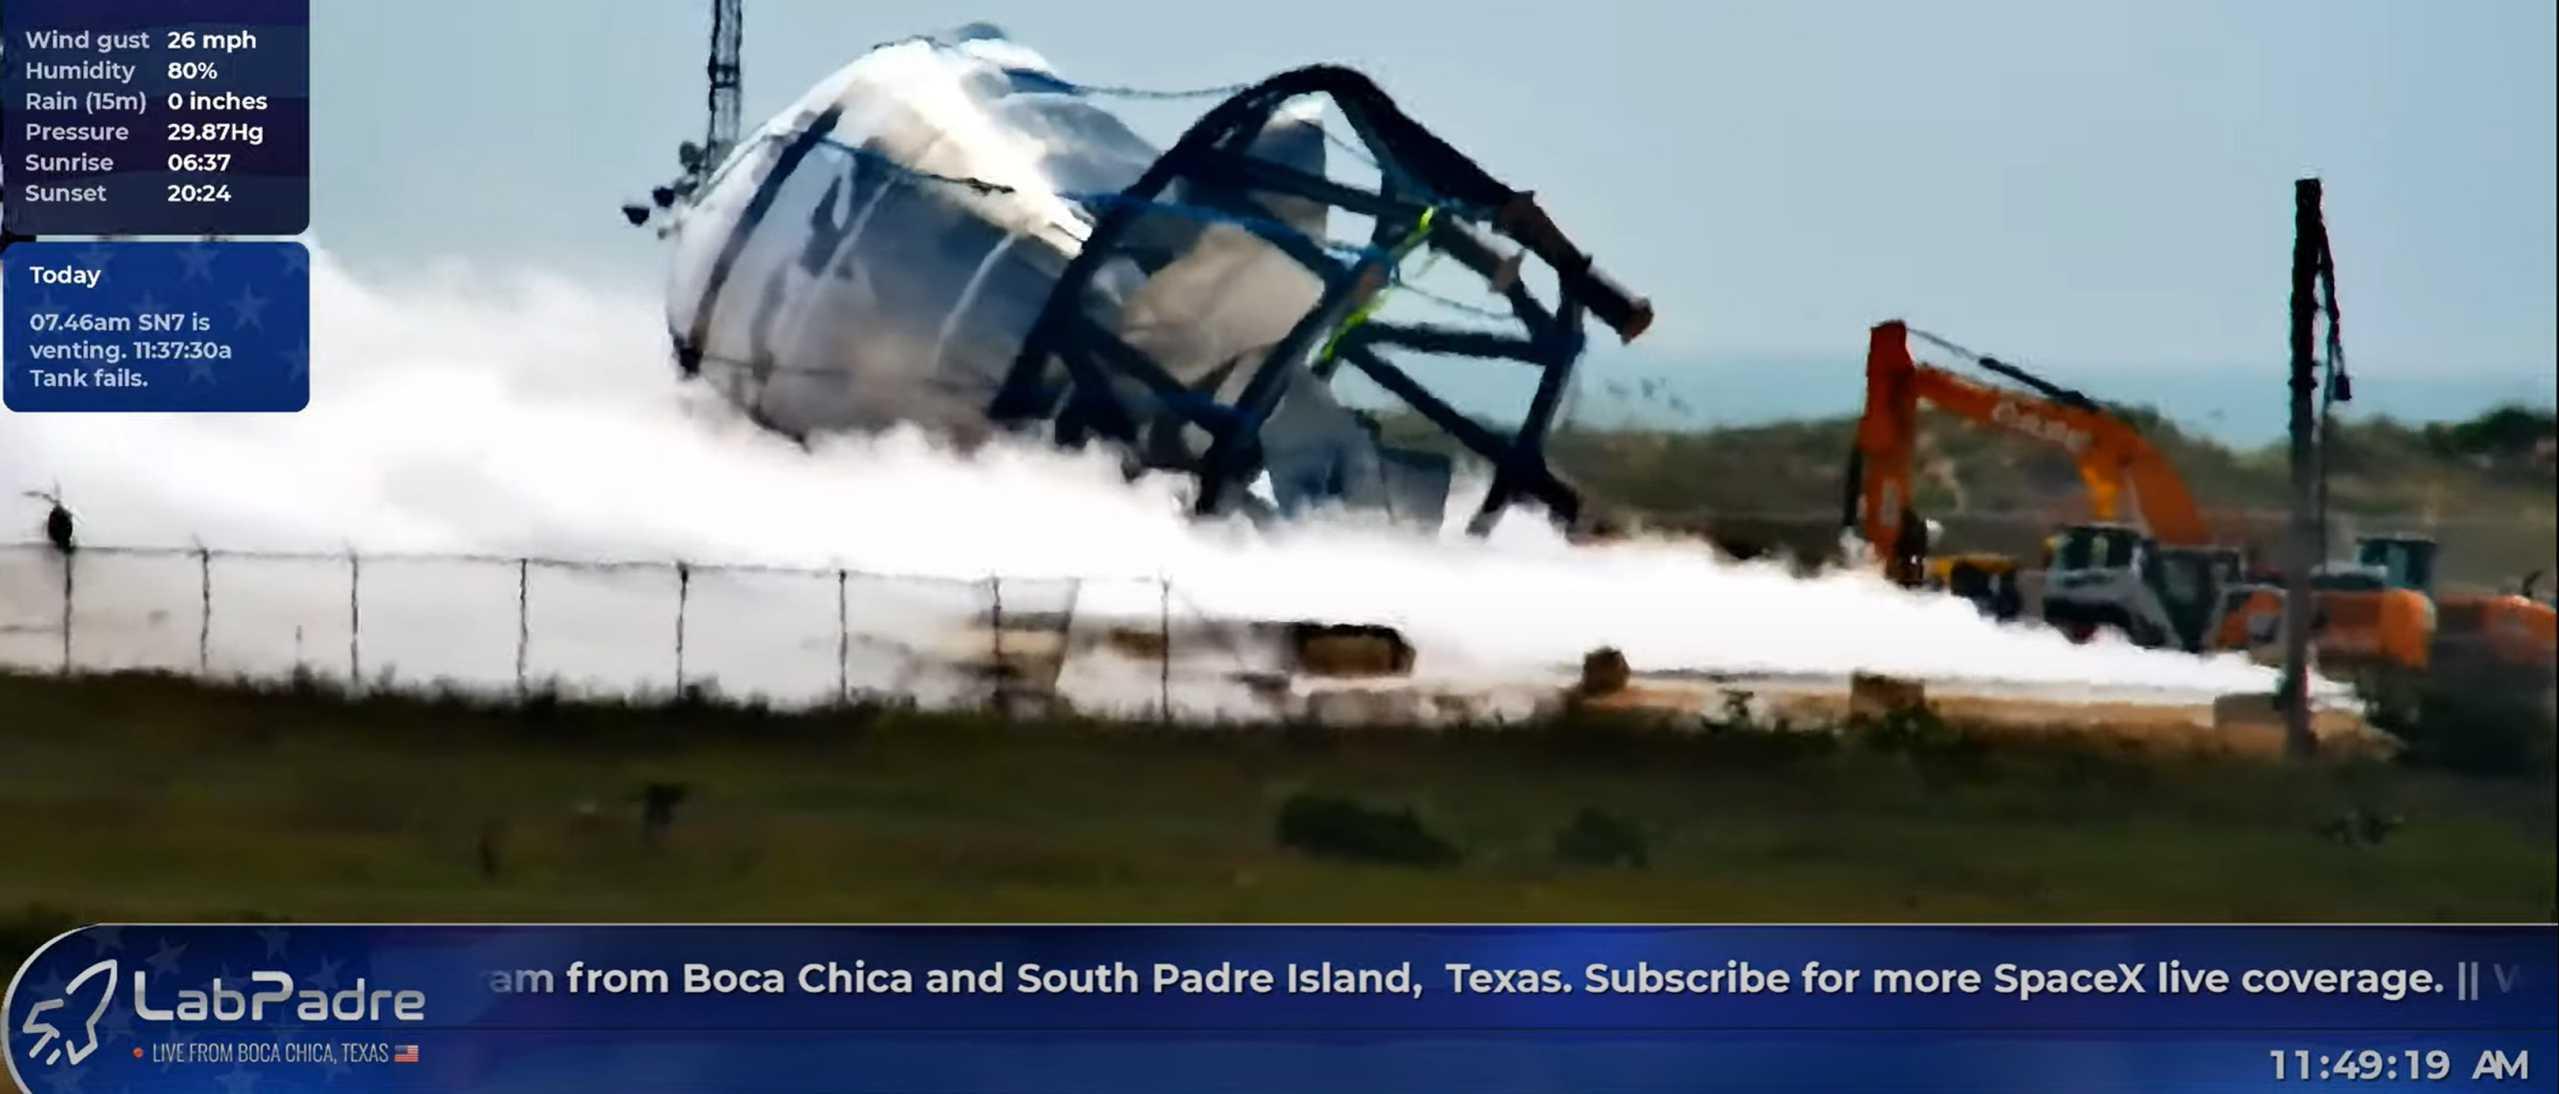 Starship test tank SN7 failure 062320 (LabPadre) 2 (c)